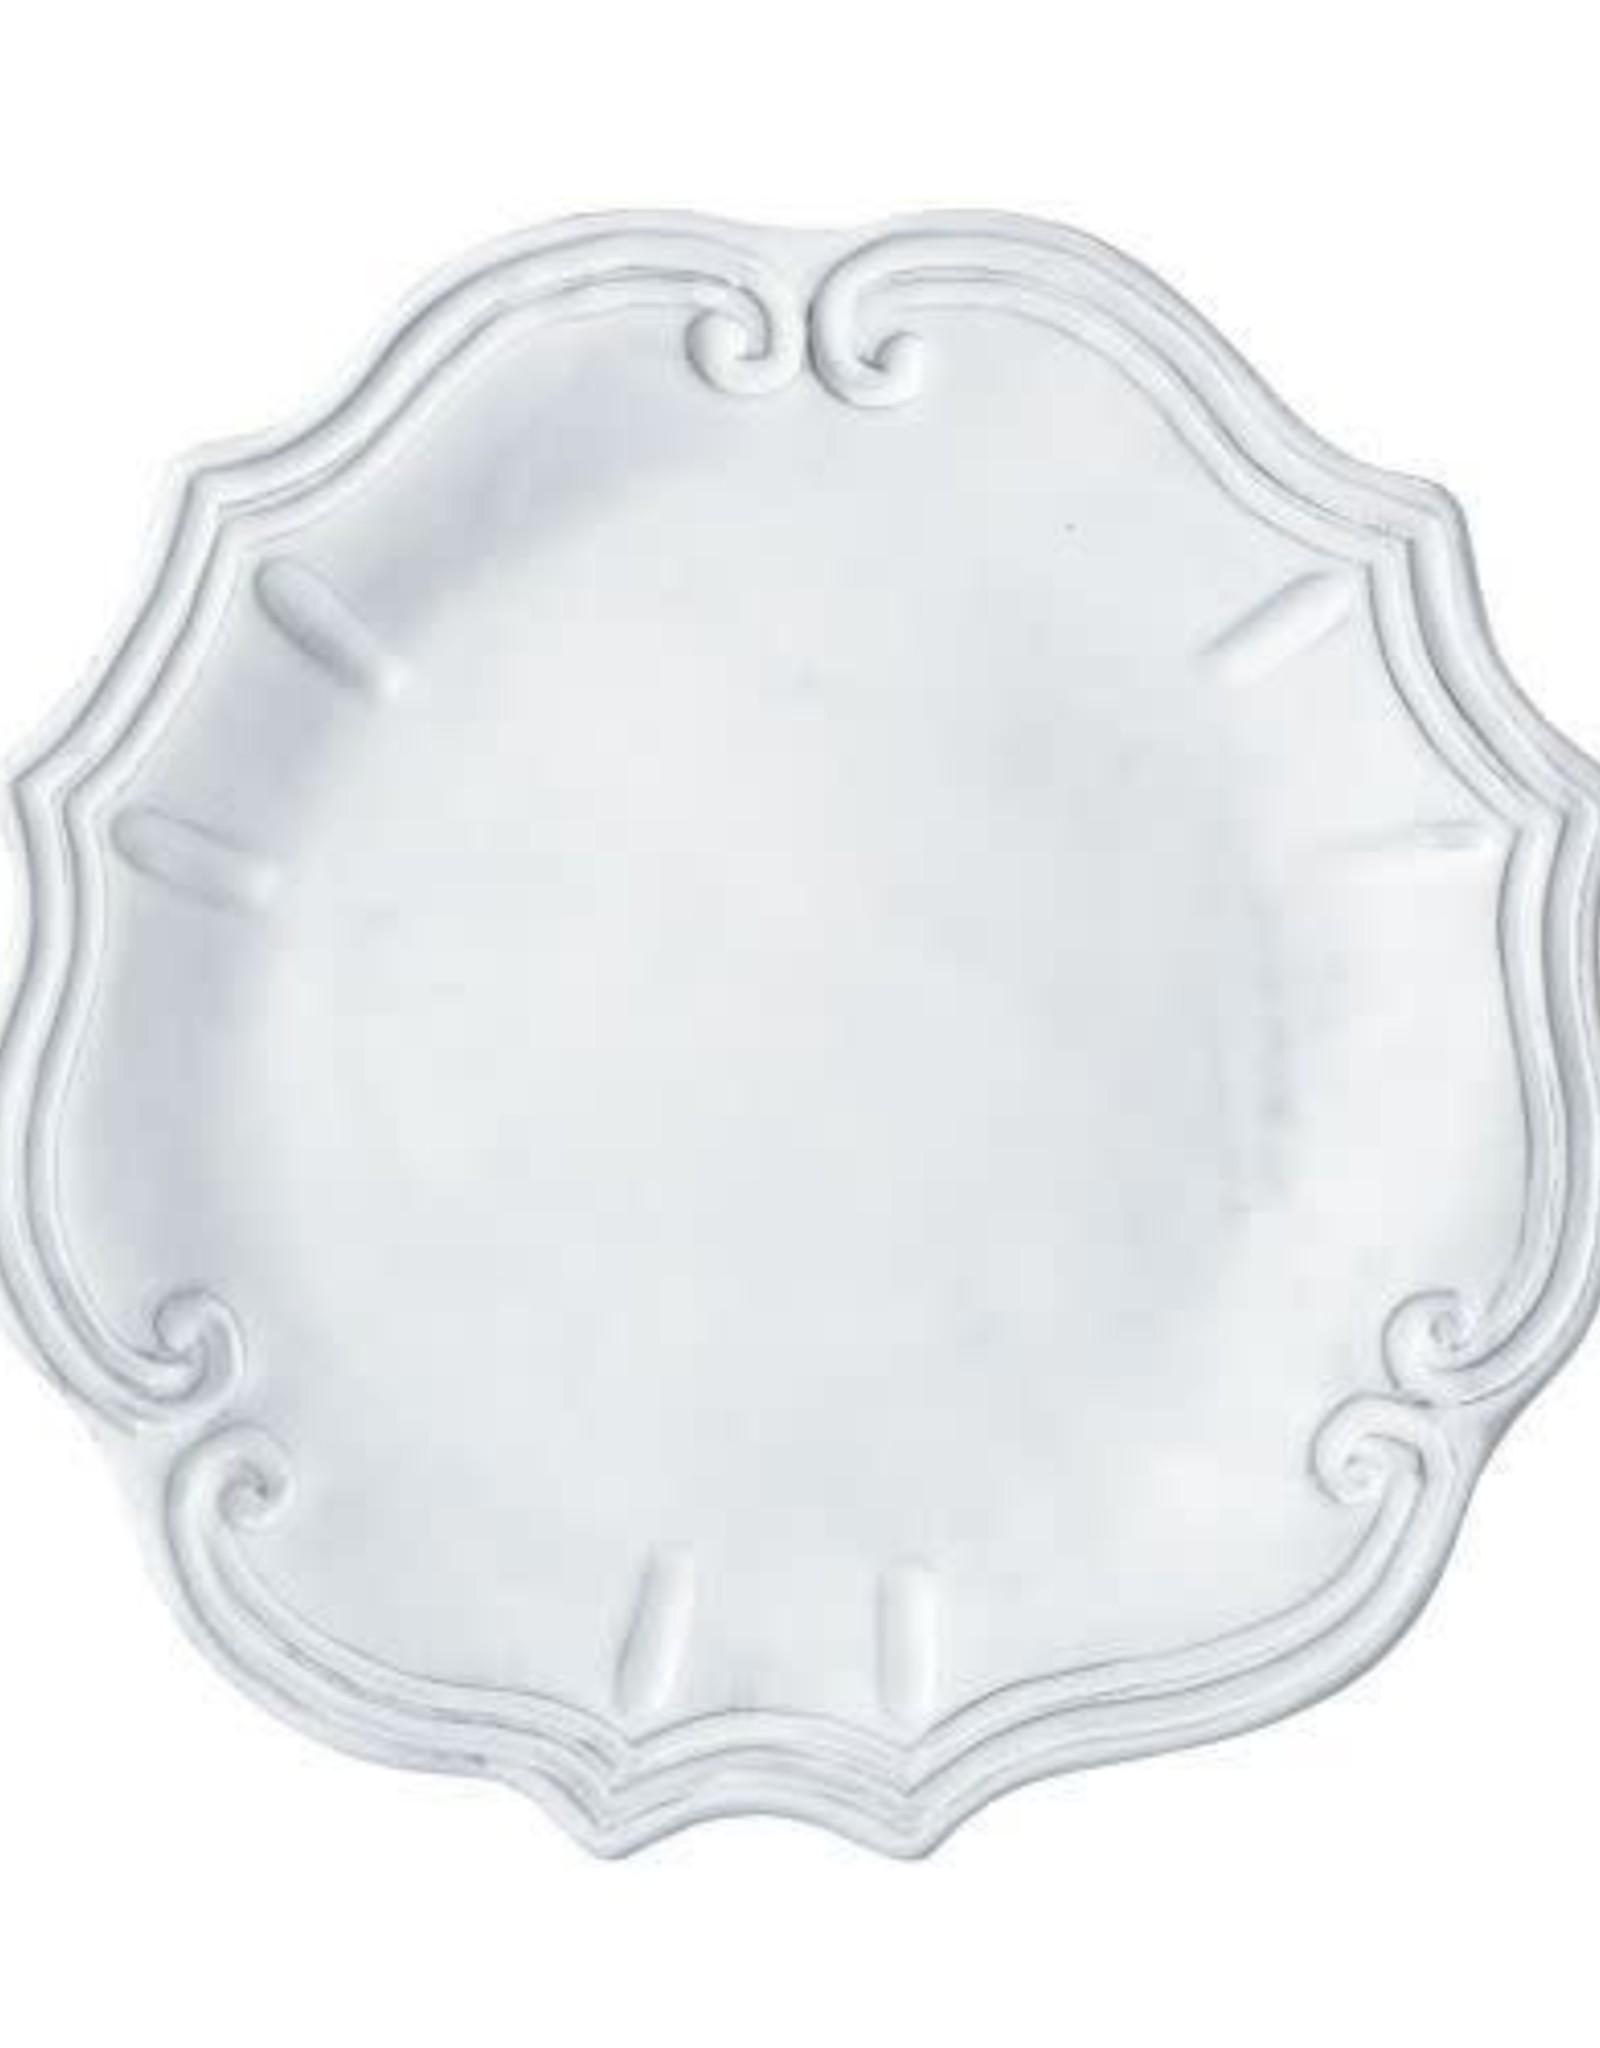 "Vietri Incanto Baroque Dinner Plate,12""D"